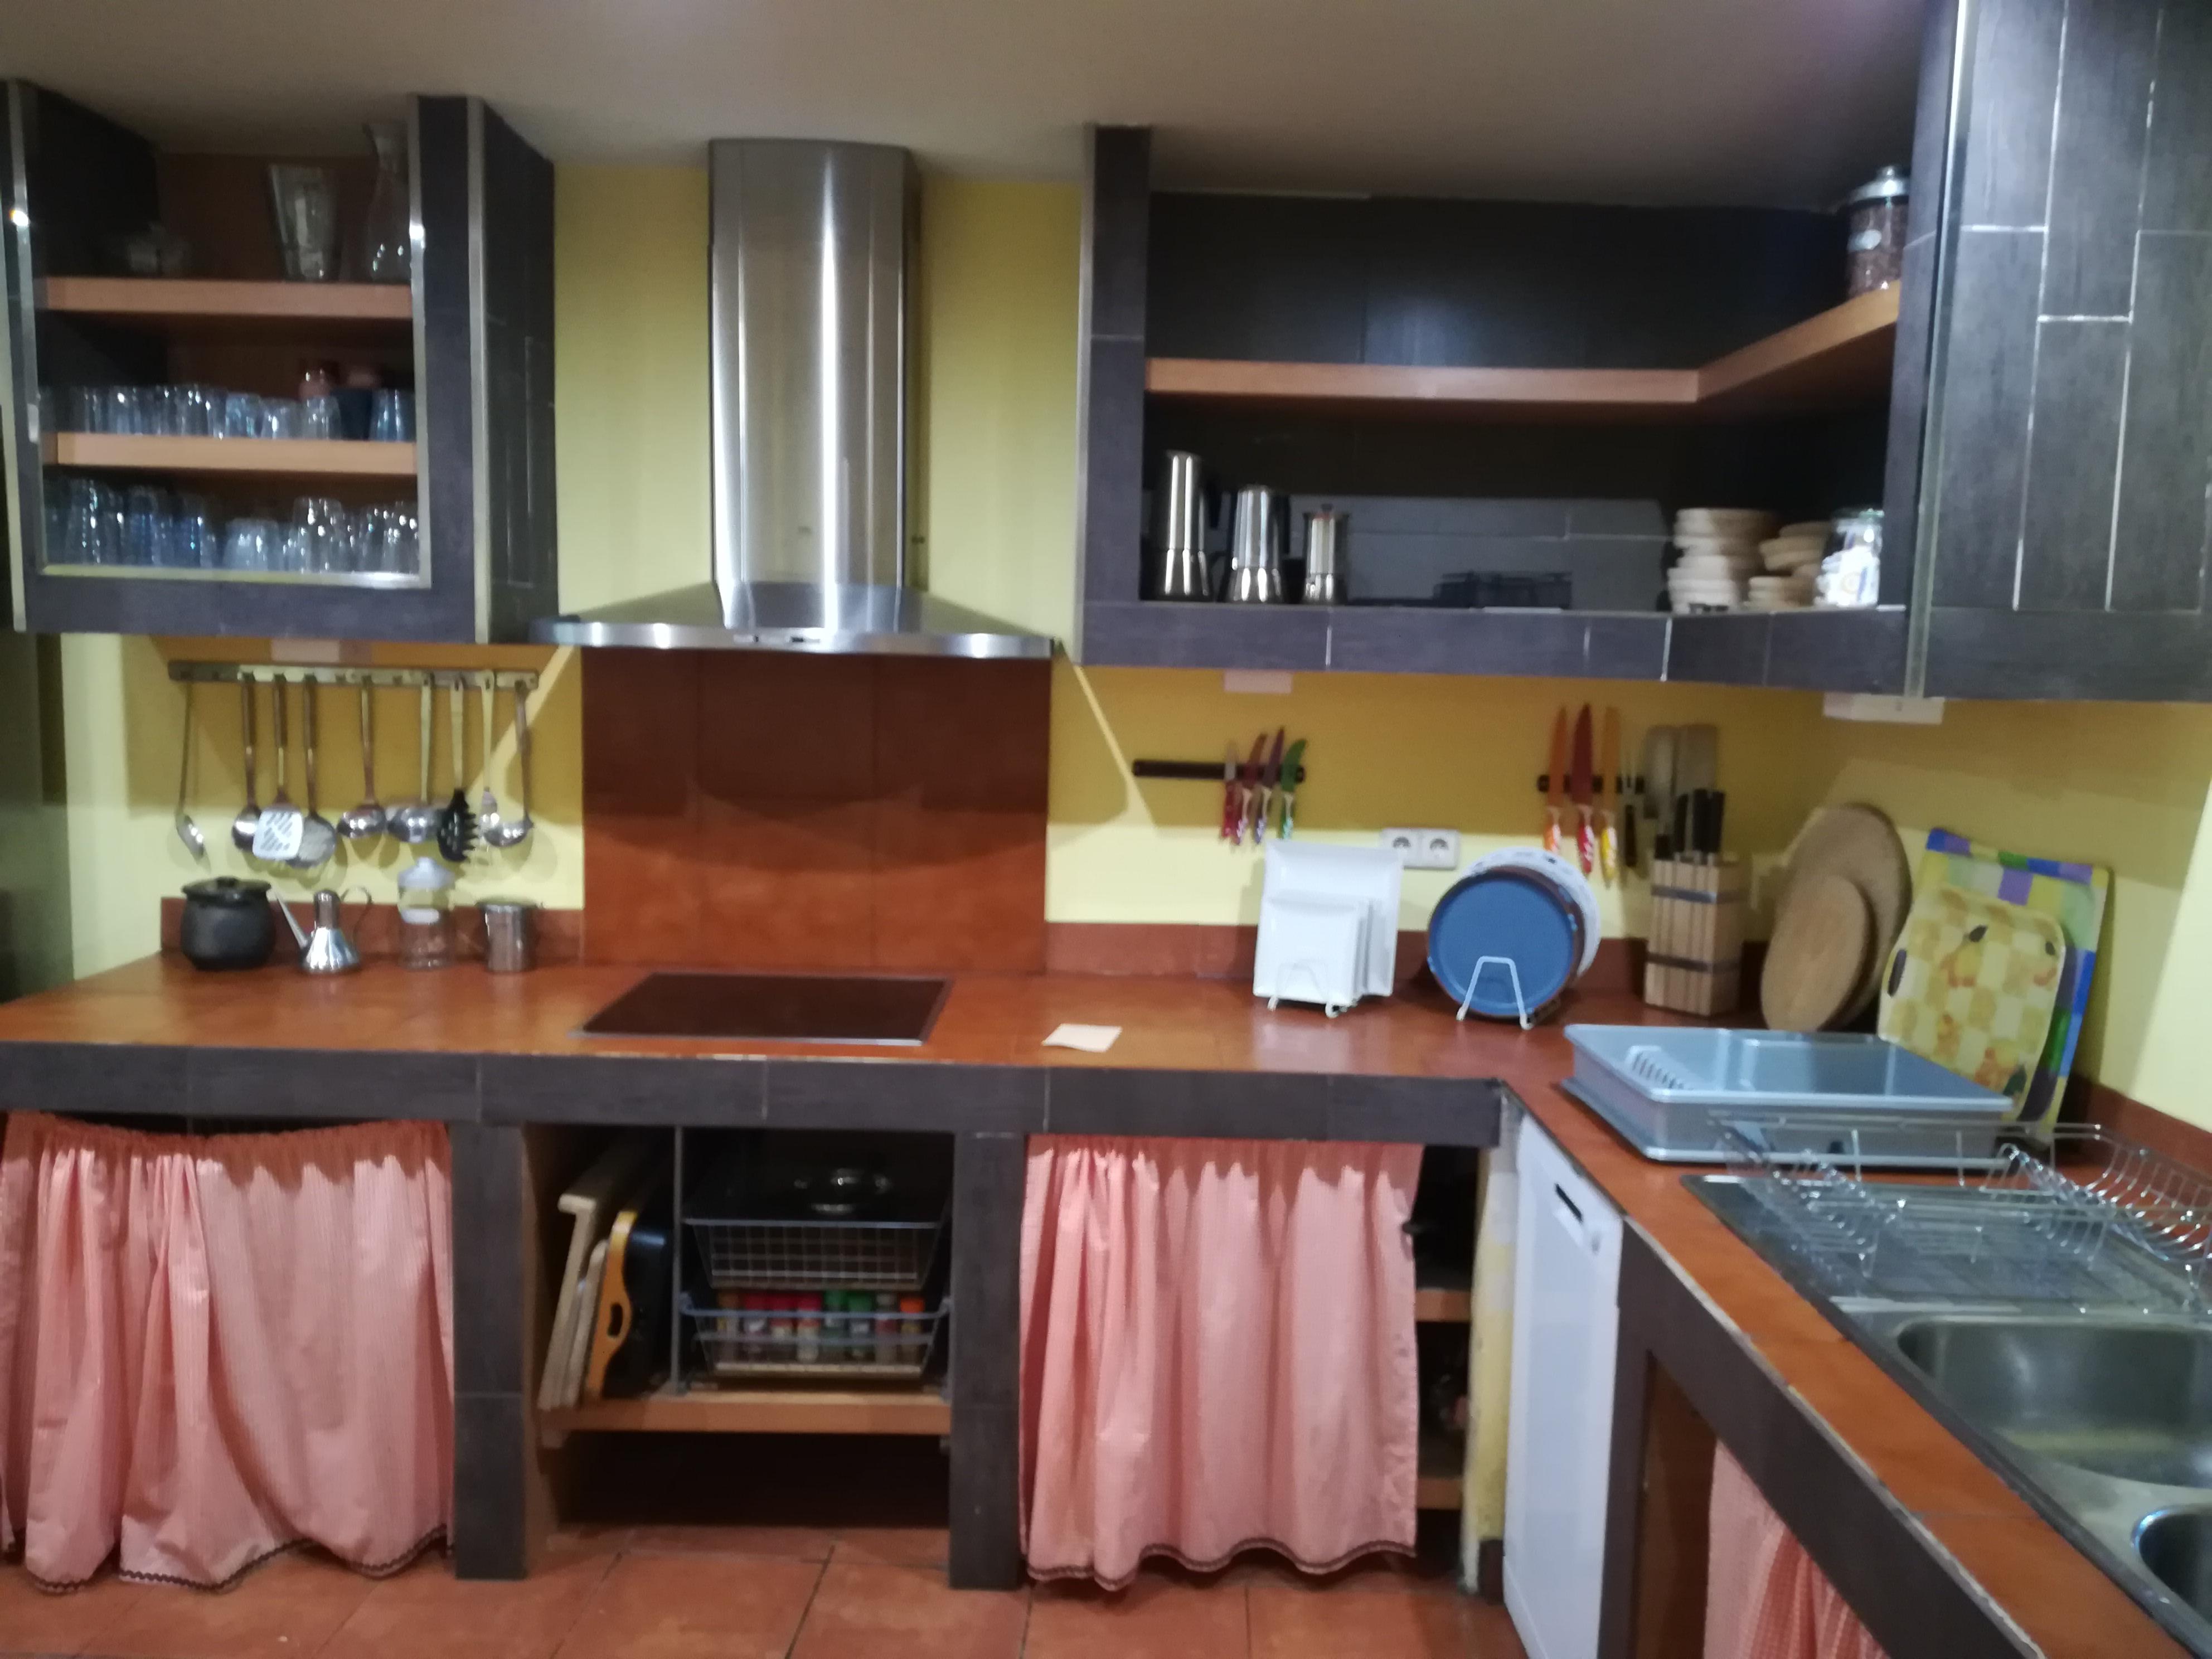 2018 06 vagalumes cocina  (7)